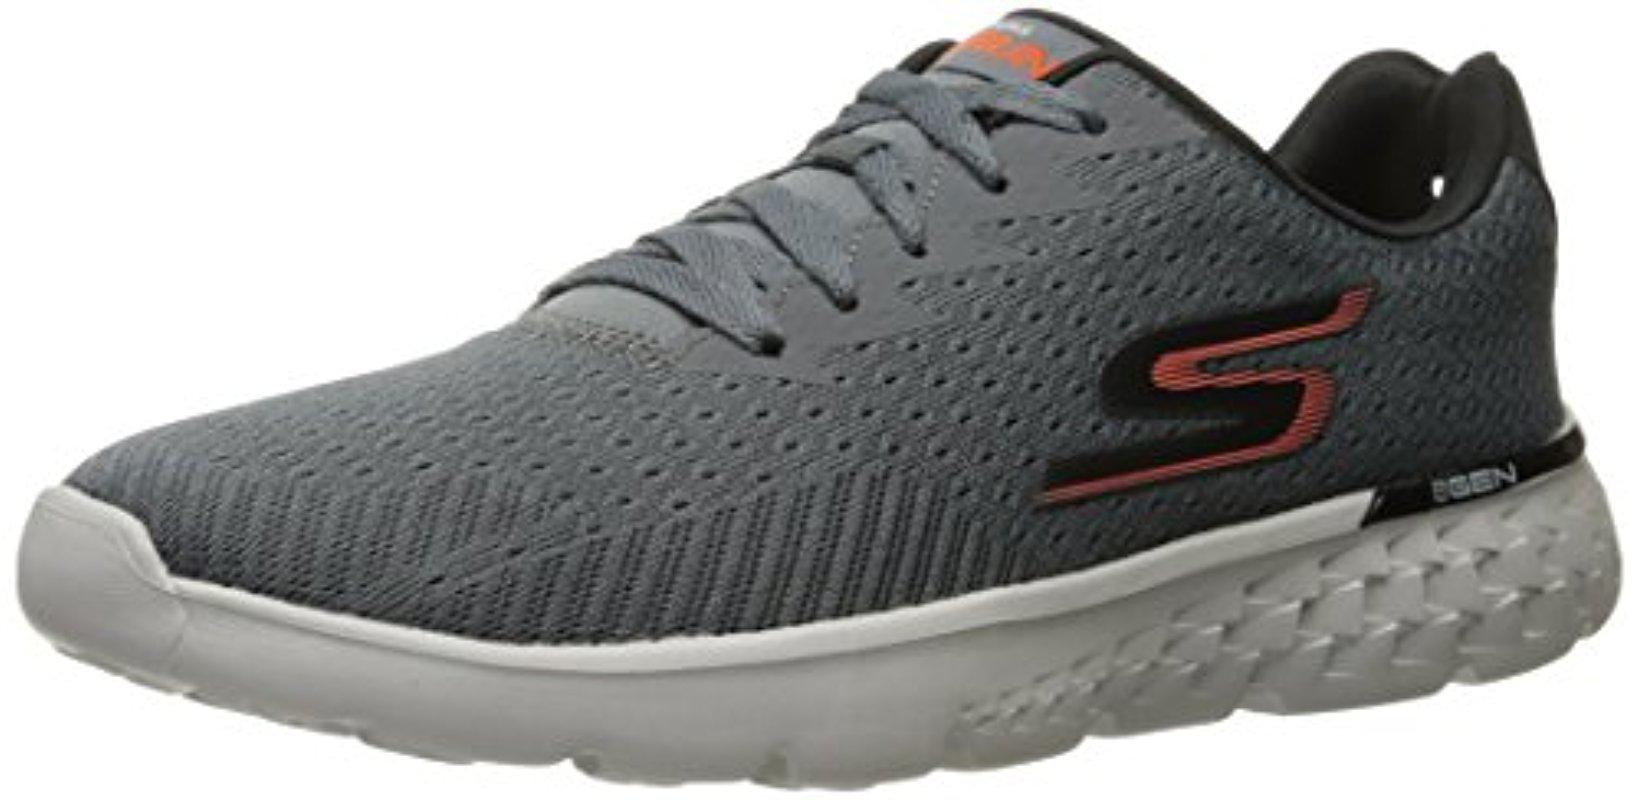 514506b805ac8 Skechers Performance Go Run 400 Disperse Running Shoe in Gray for ...